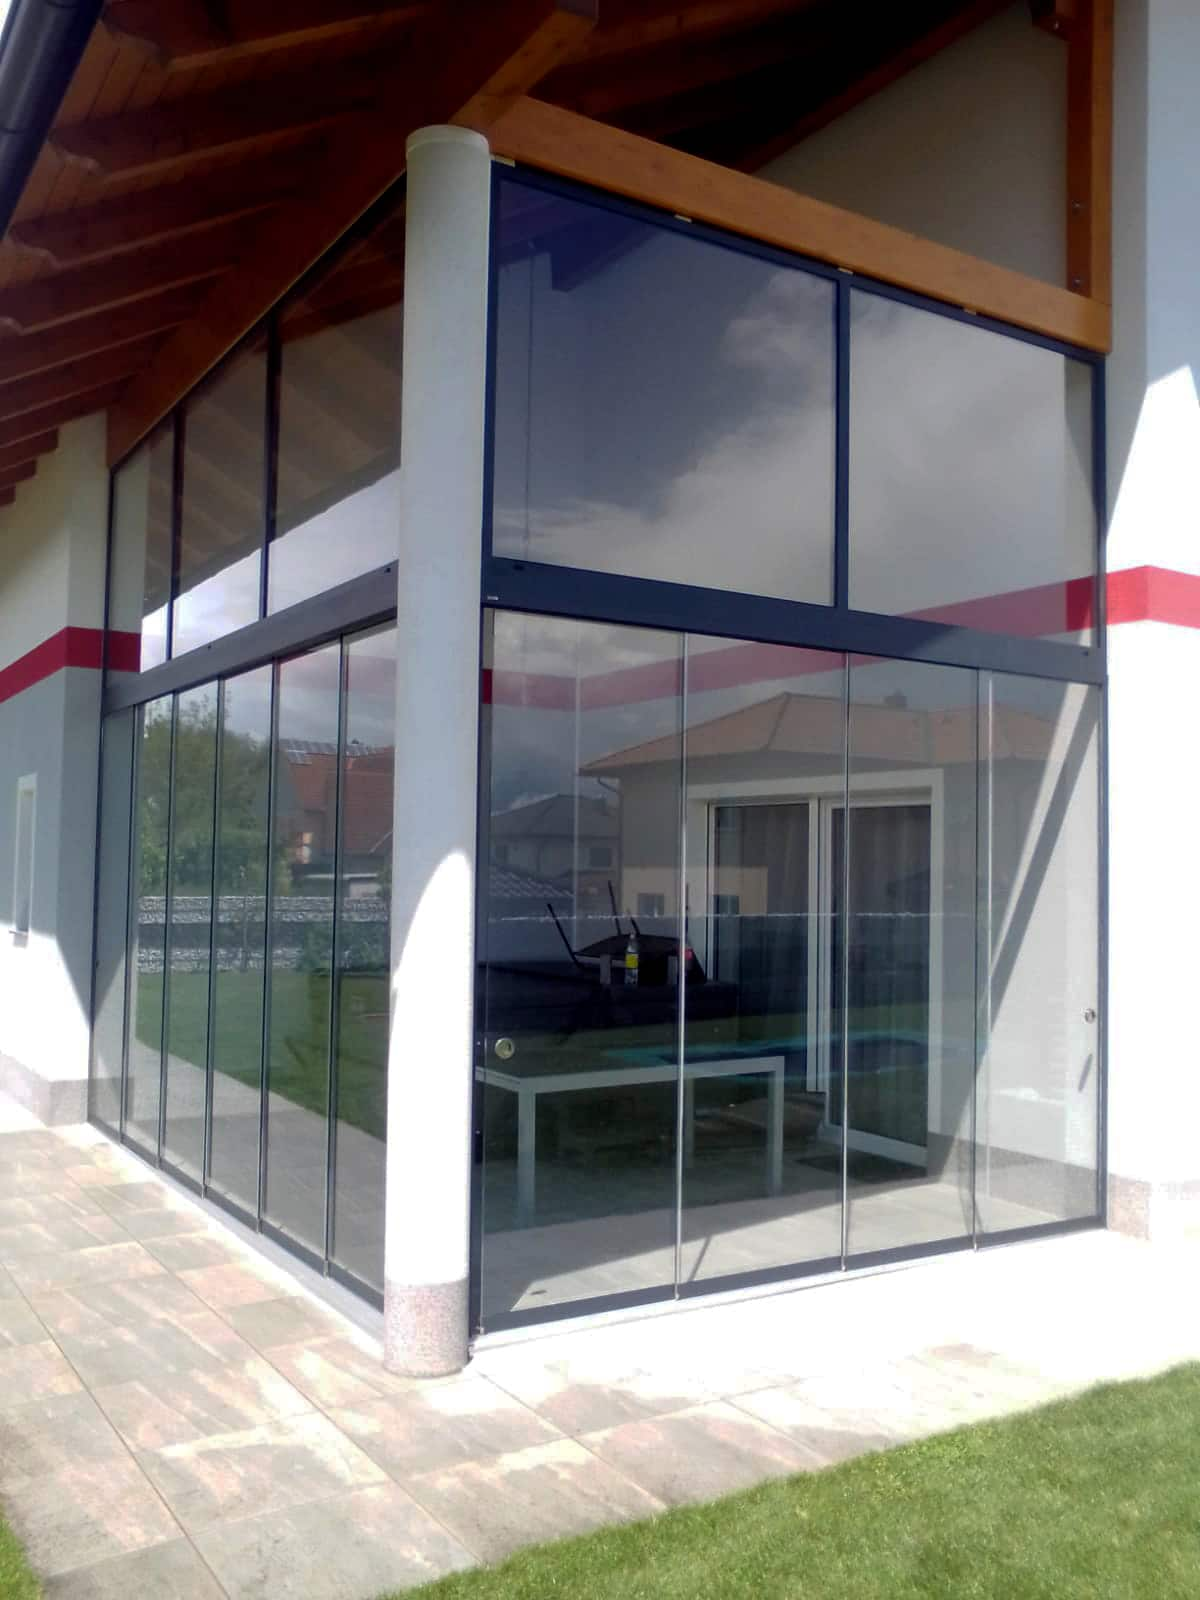 Glasschiebewand Terrasse nach Maß - in OÖ